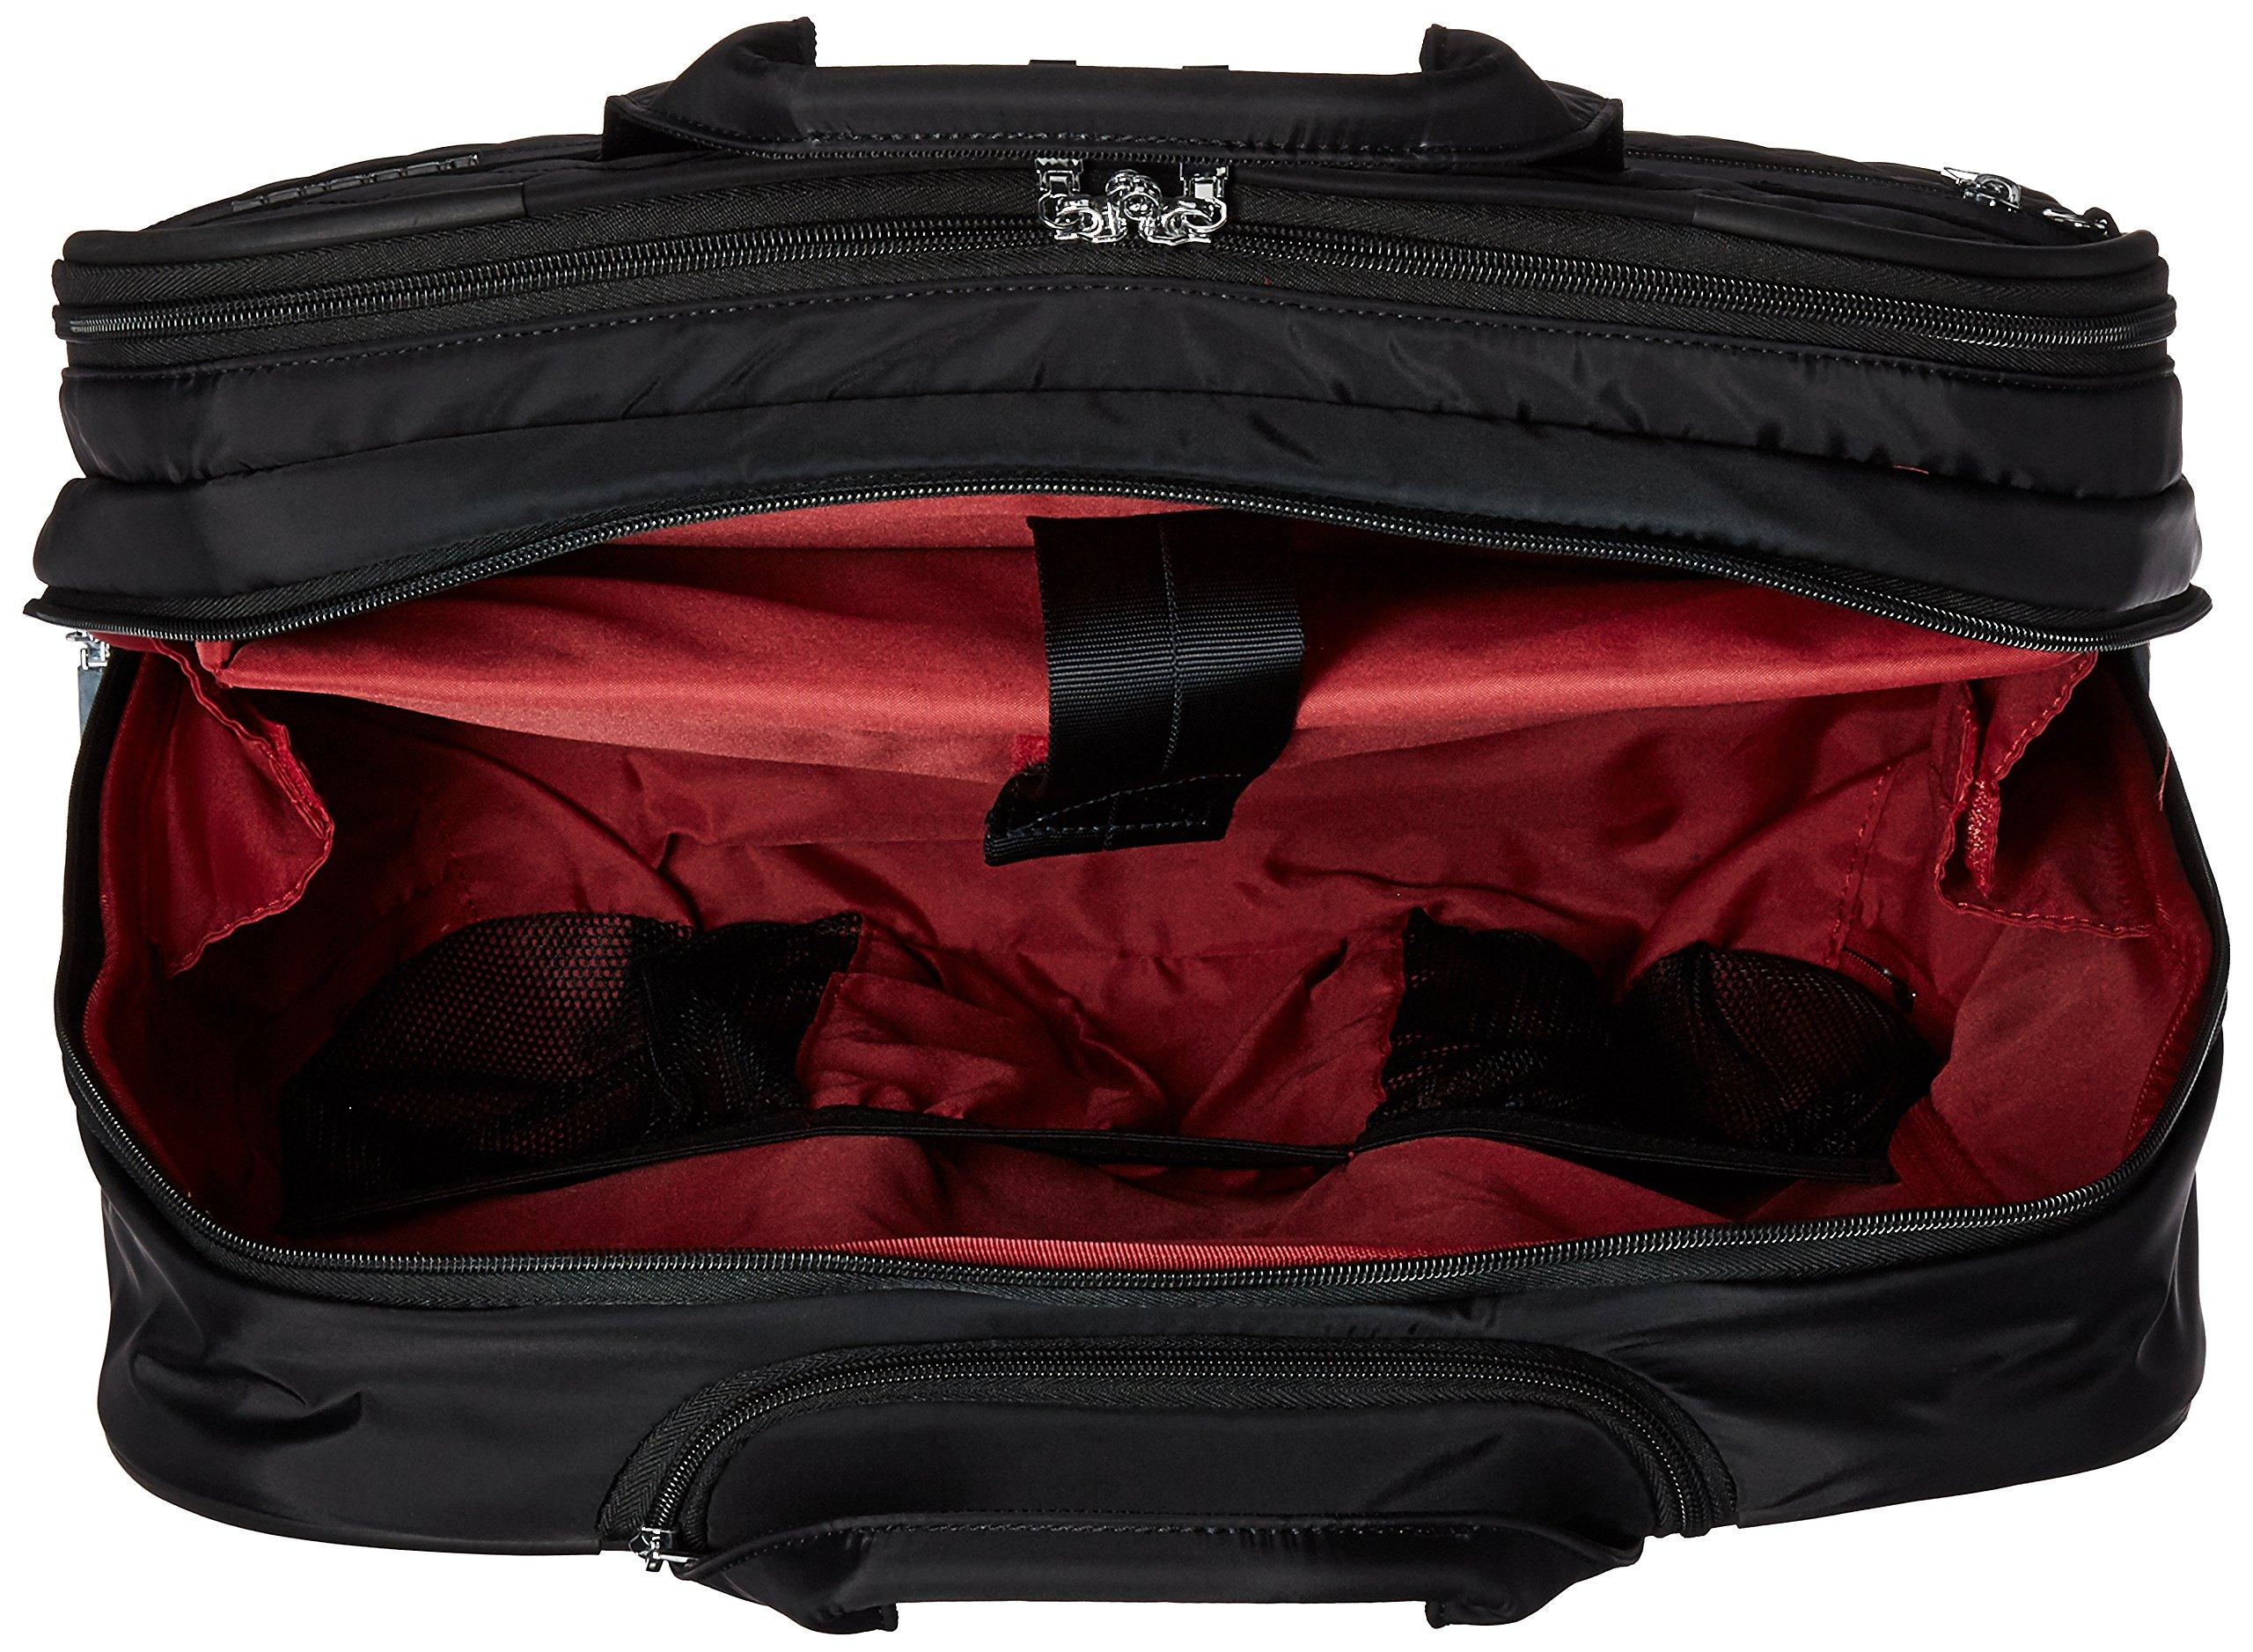 Hedgren Cindy Business Trolley 15.6 Briefcase, Black by Hedgren (Image #5)